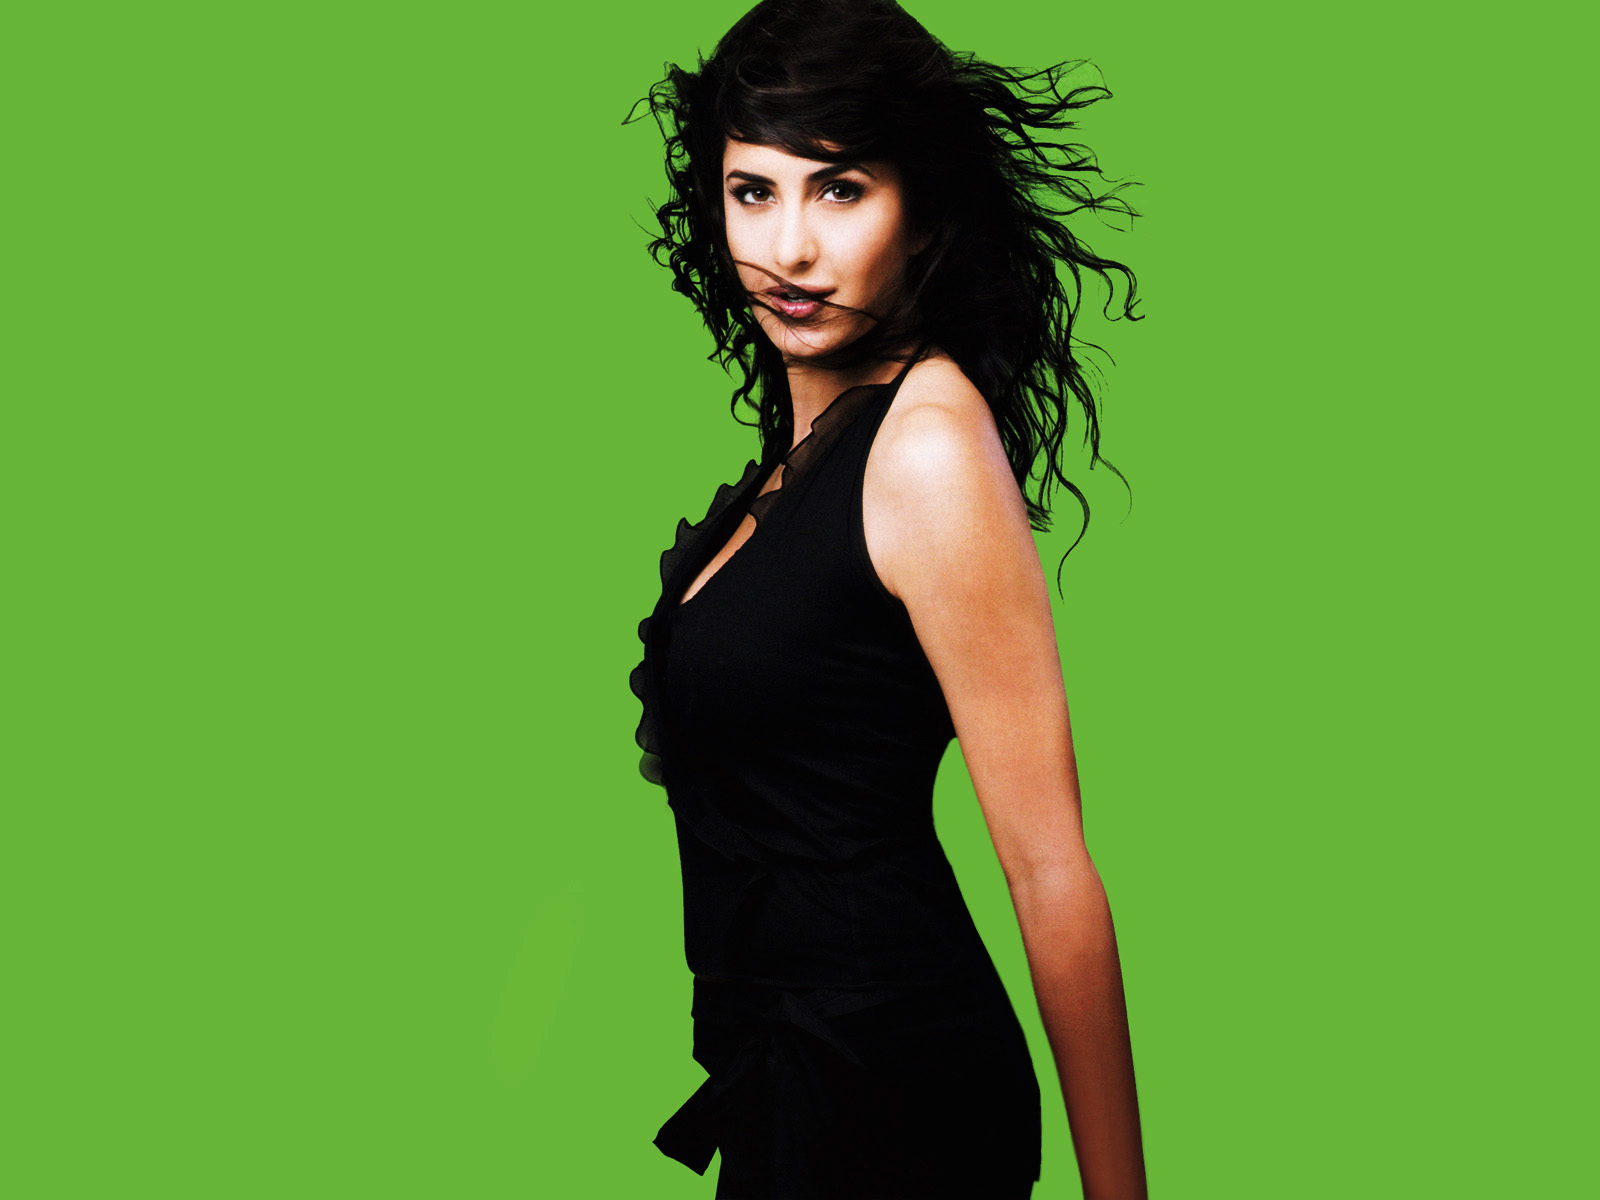 Free Photos: Katrina Kaif in Black Dress HD Wallpapers